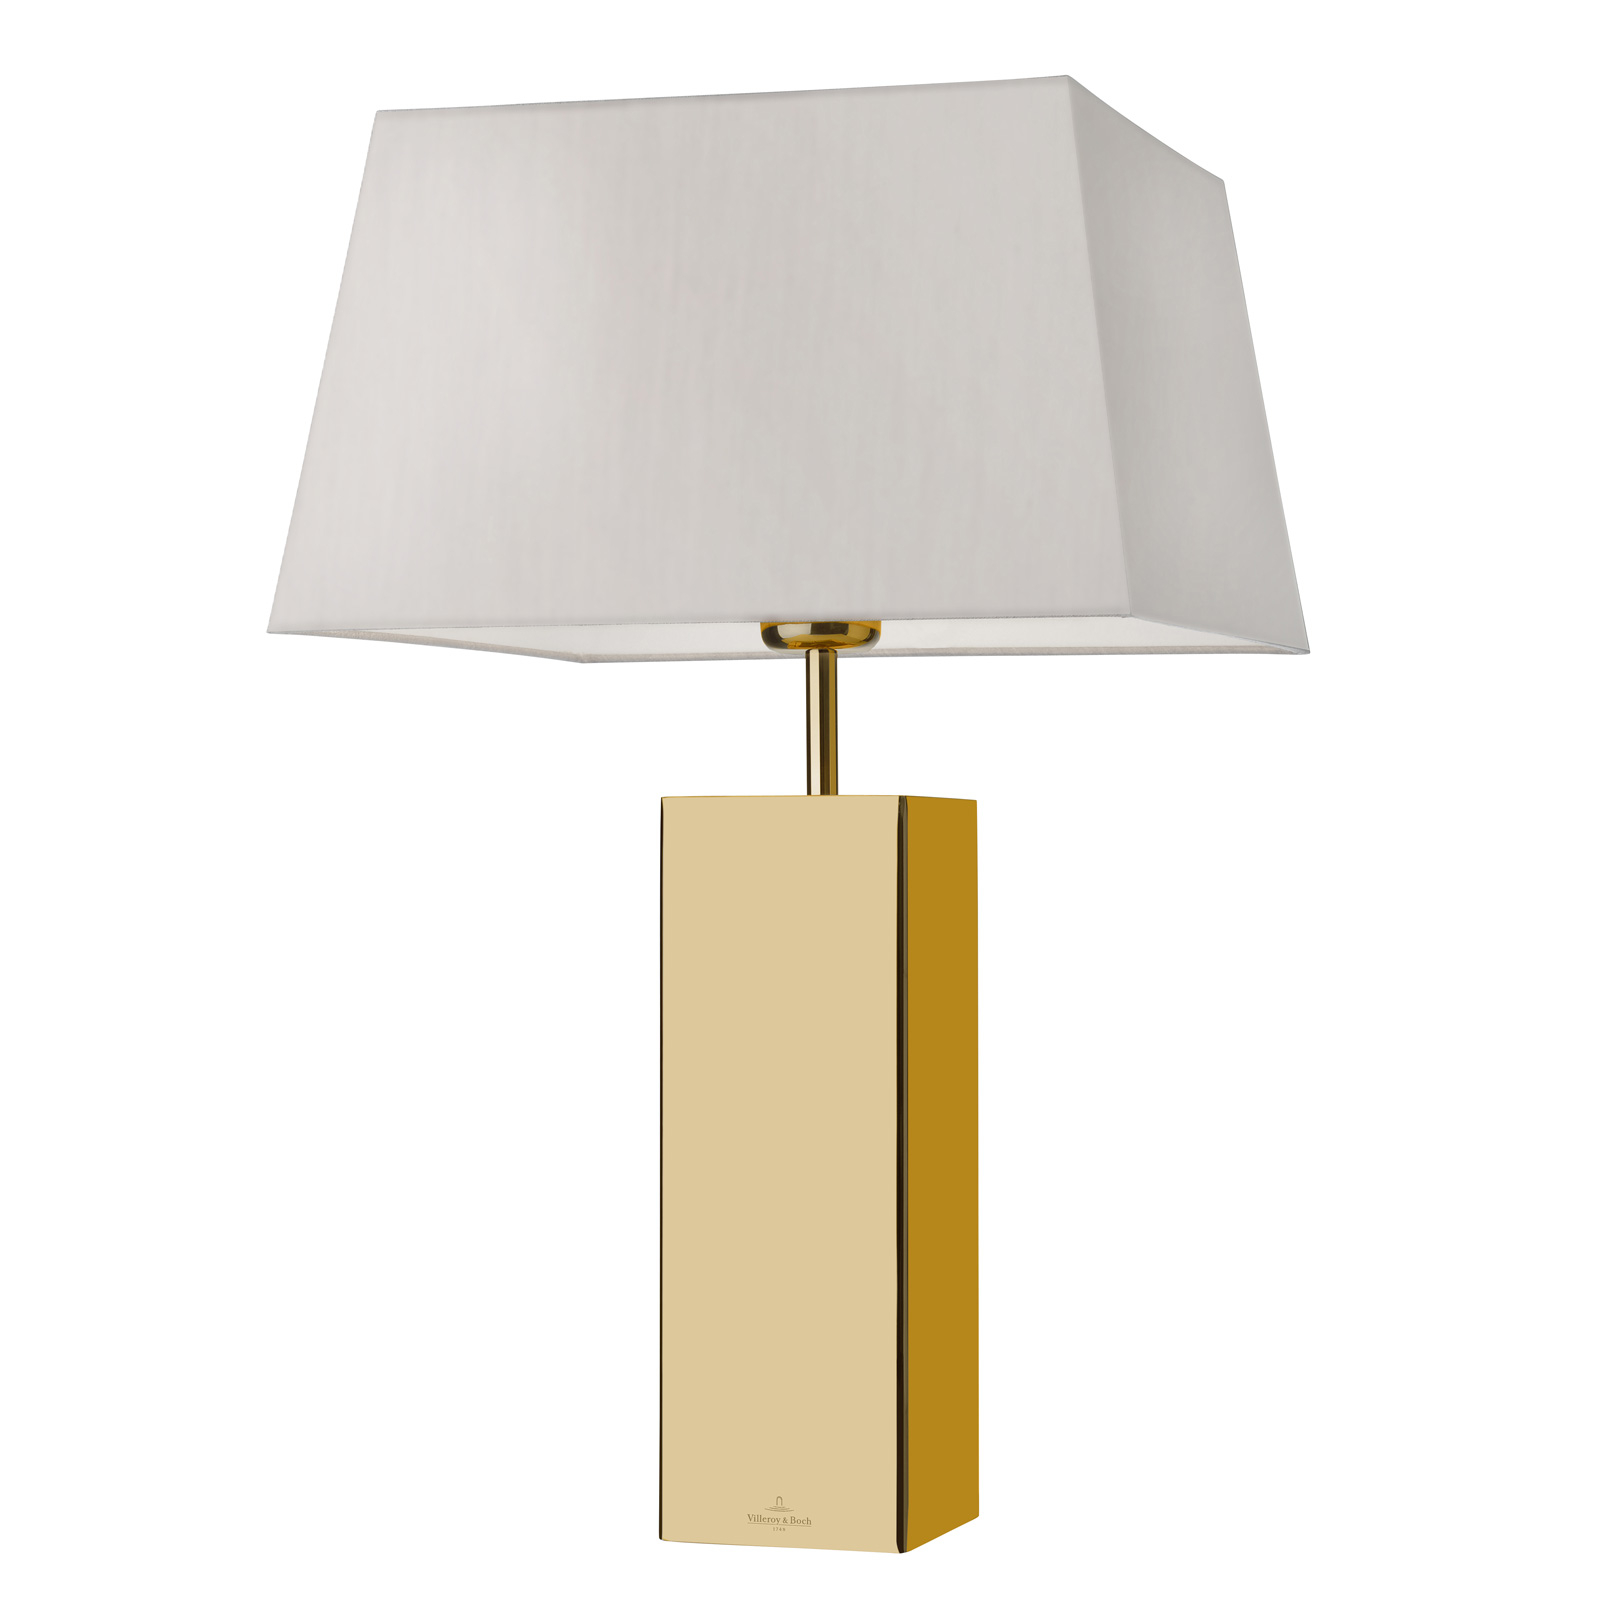 Villeroy & Boch Prag Tischlampe in Goldoptik